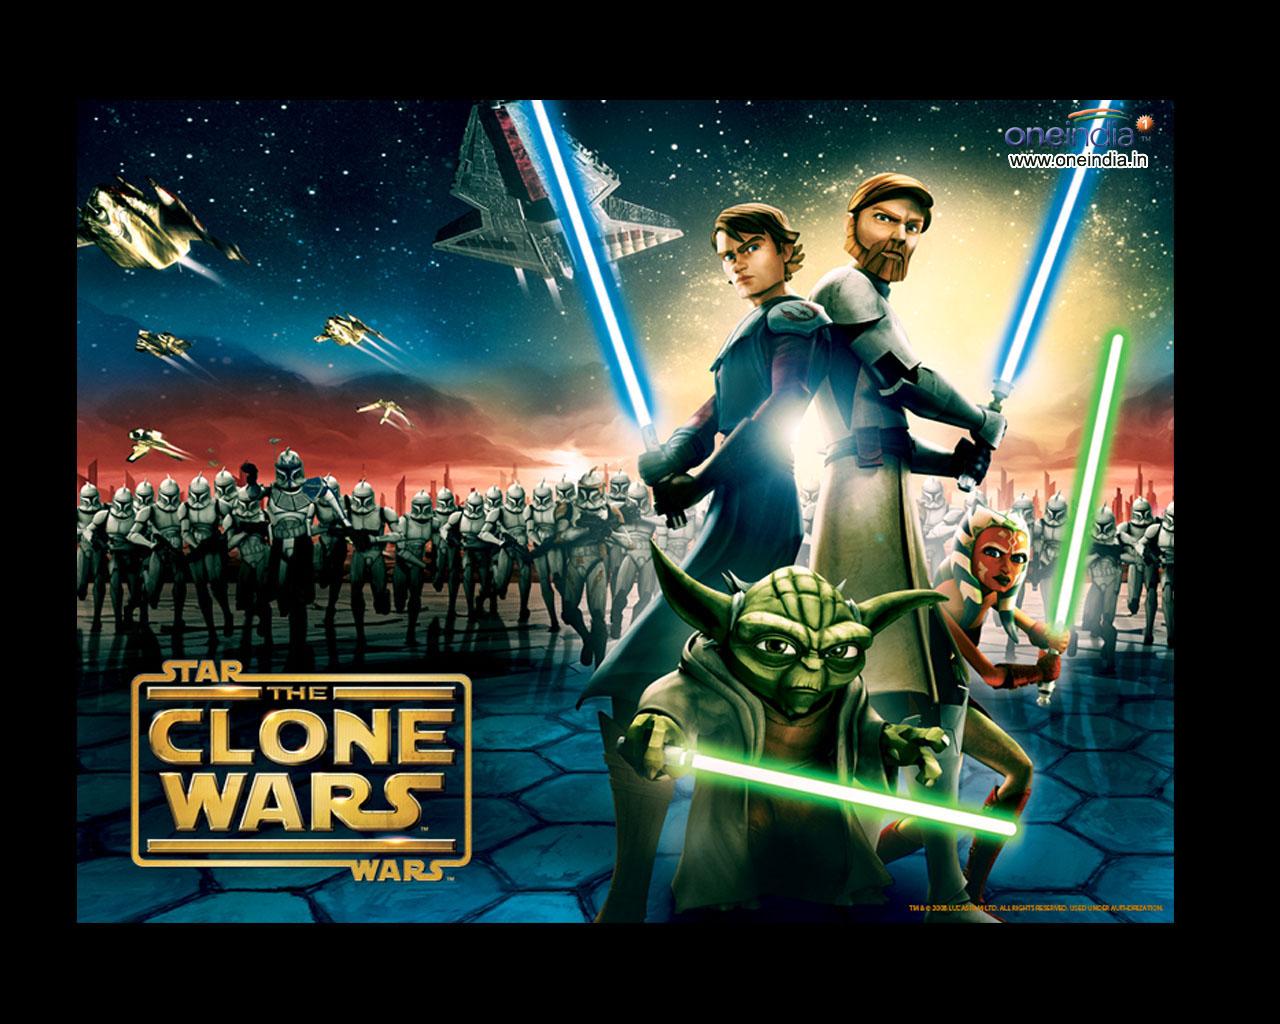 The Clone Wars - Global Series TV | 1280 x 1024 jpeg 270kB